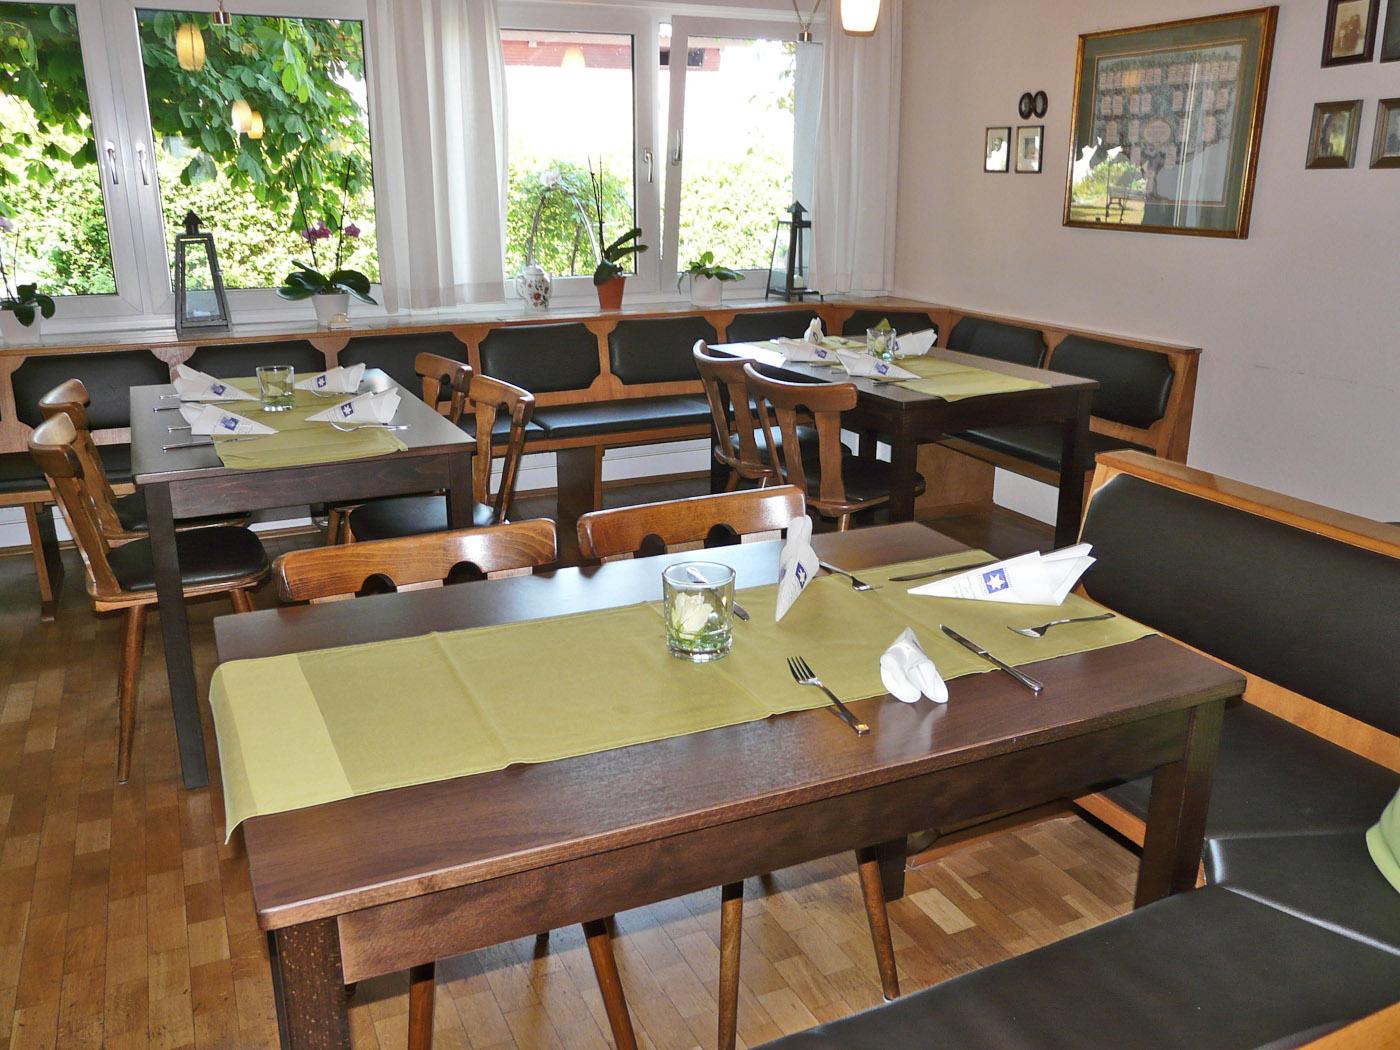 Moos Bankholzen Landgasthof Hotel Zum Sternen